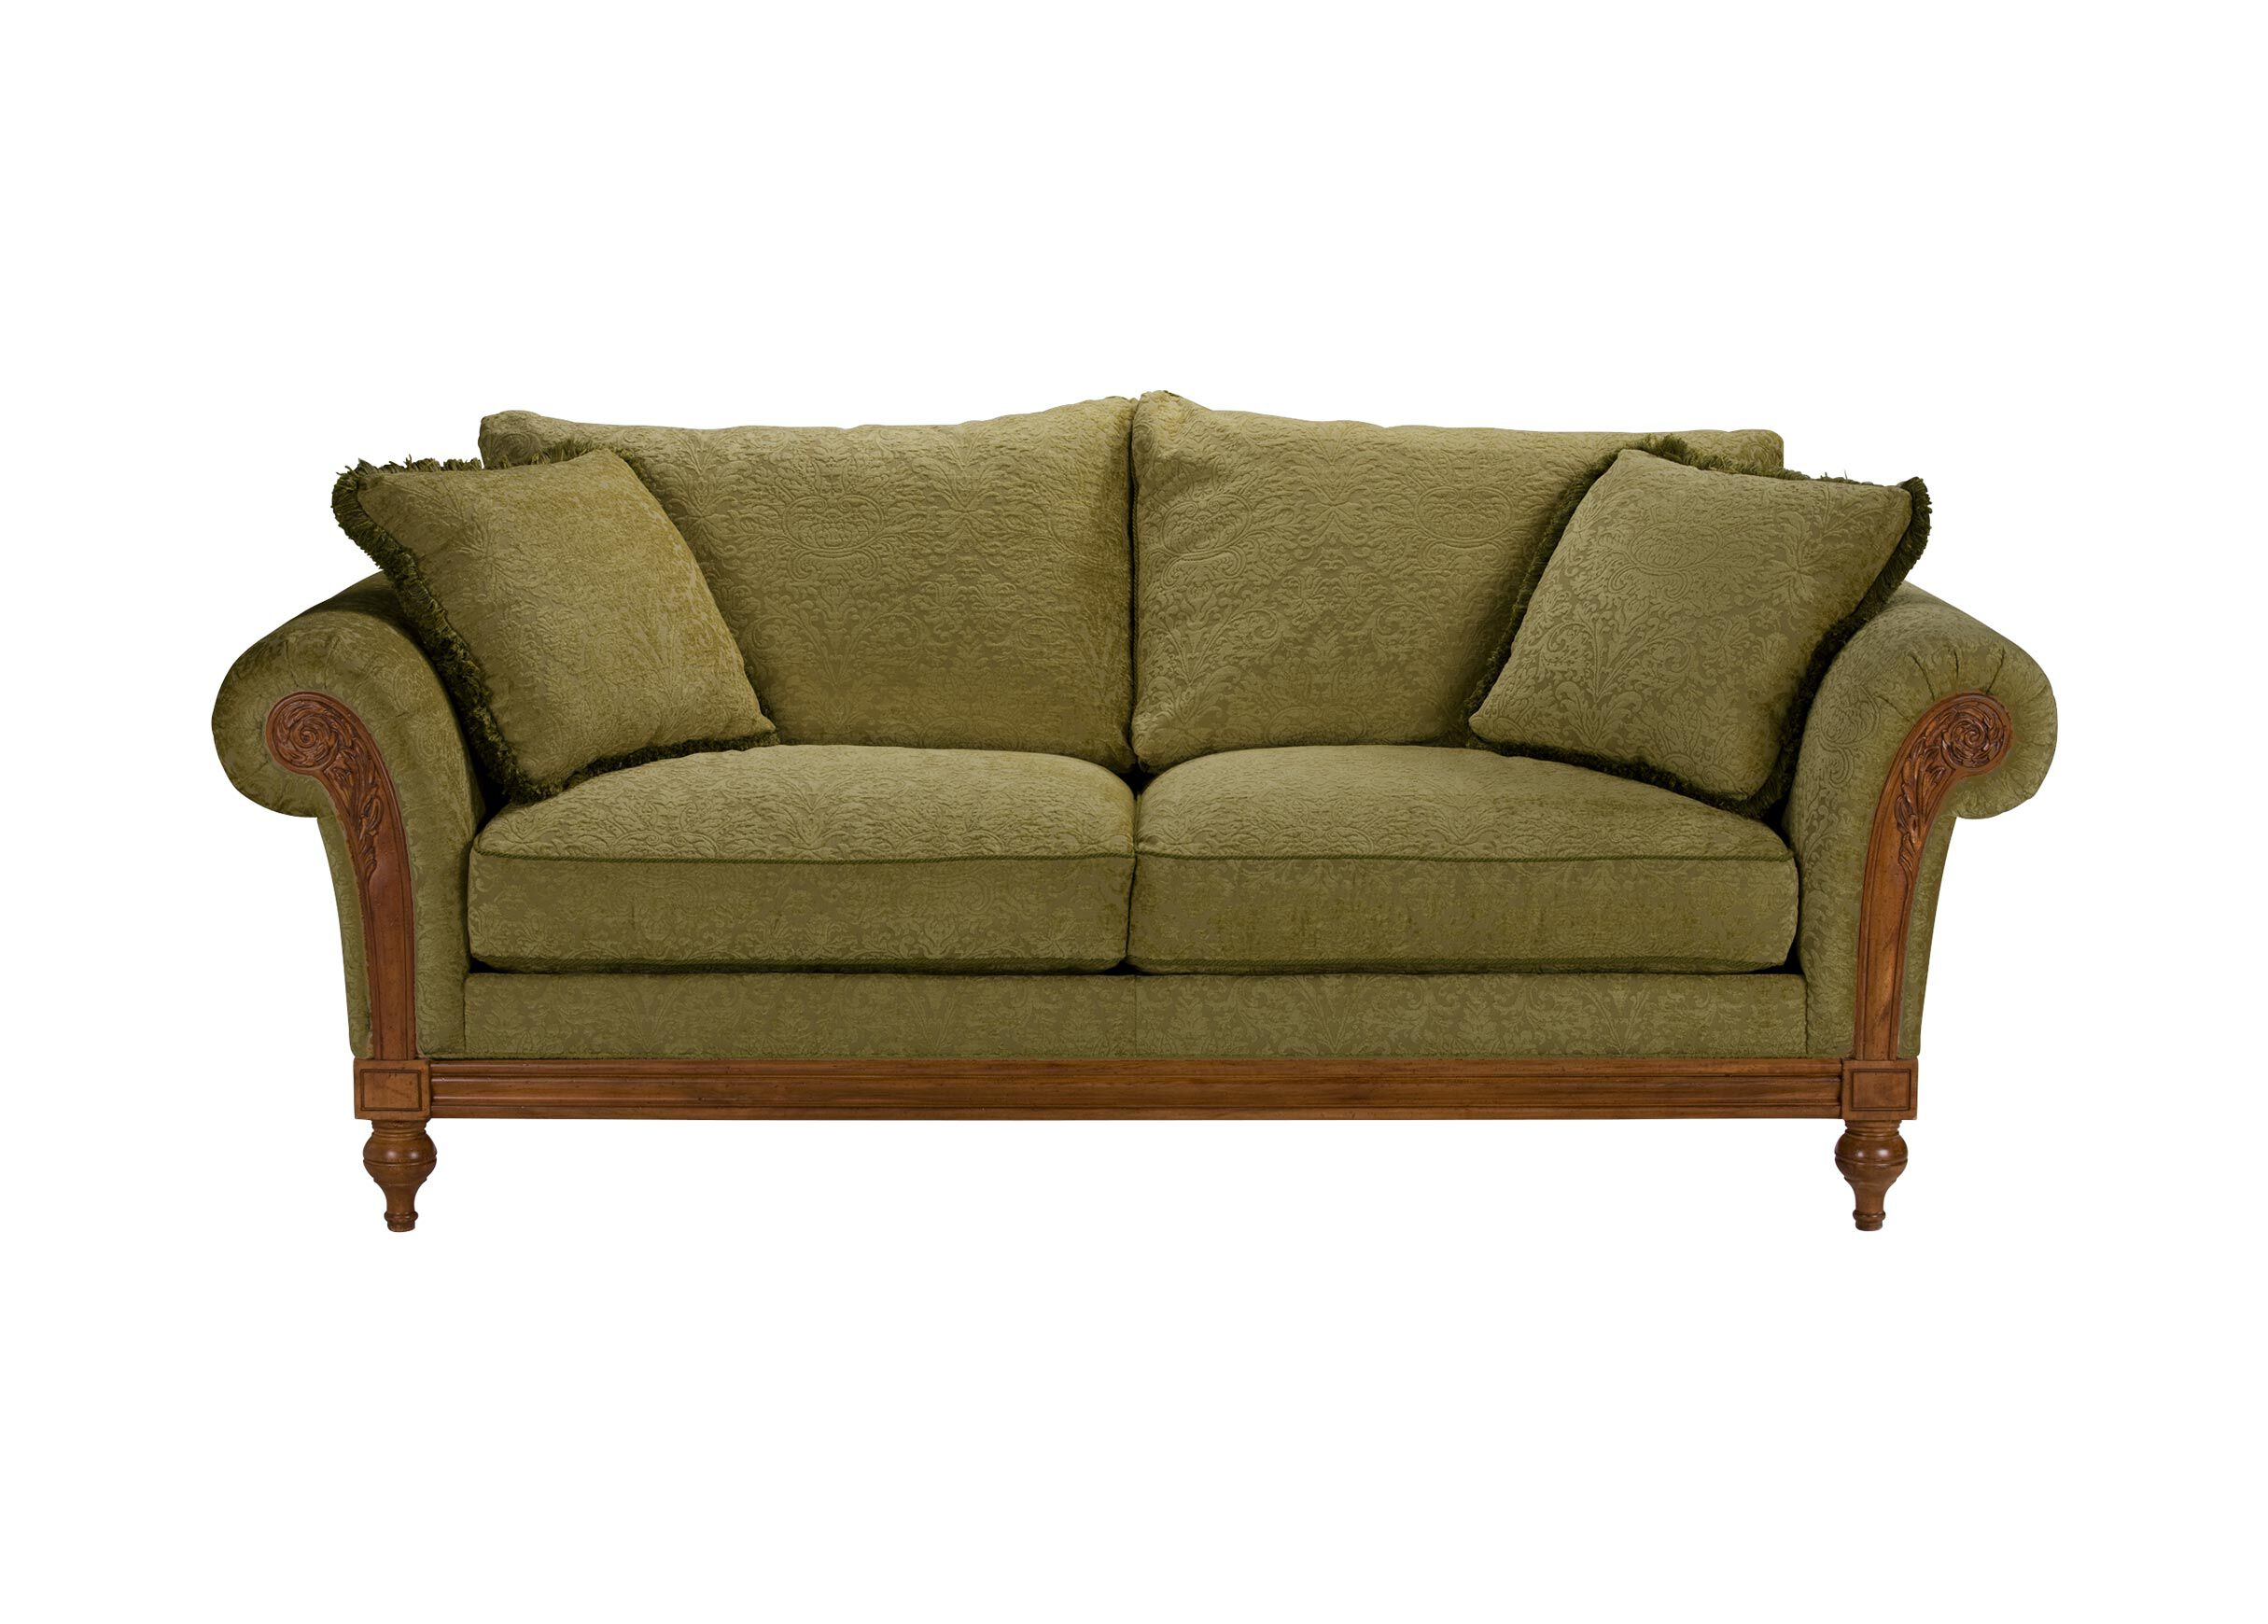 pratt sofa sofas loveseats ethan allen rh ethanallen com